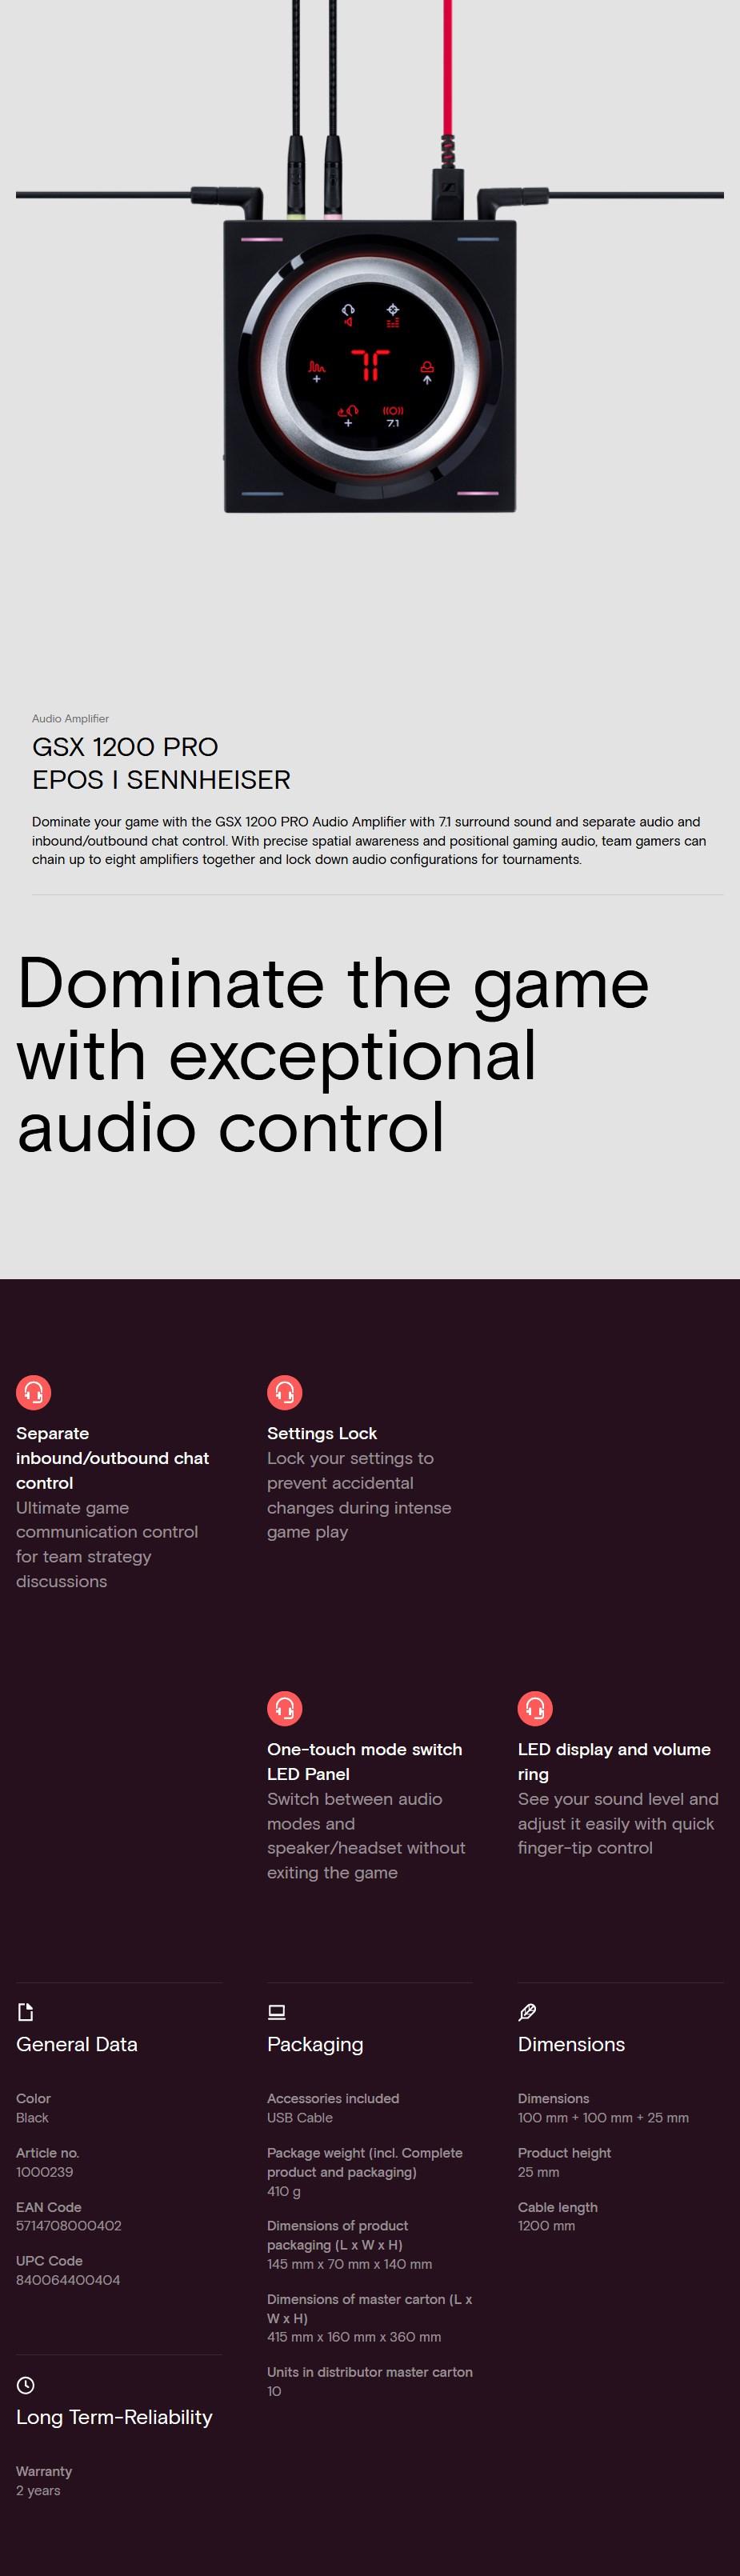 epos-sennheiser-gsx-1200-pro-virtual-71-gaming-audio-amplifier-ac36278-5.jpg